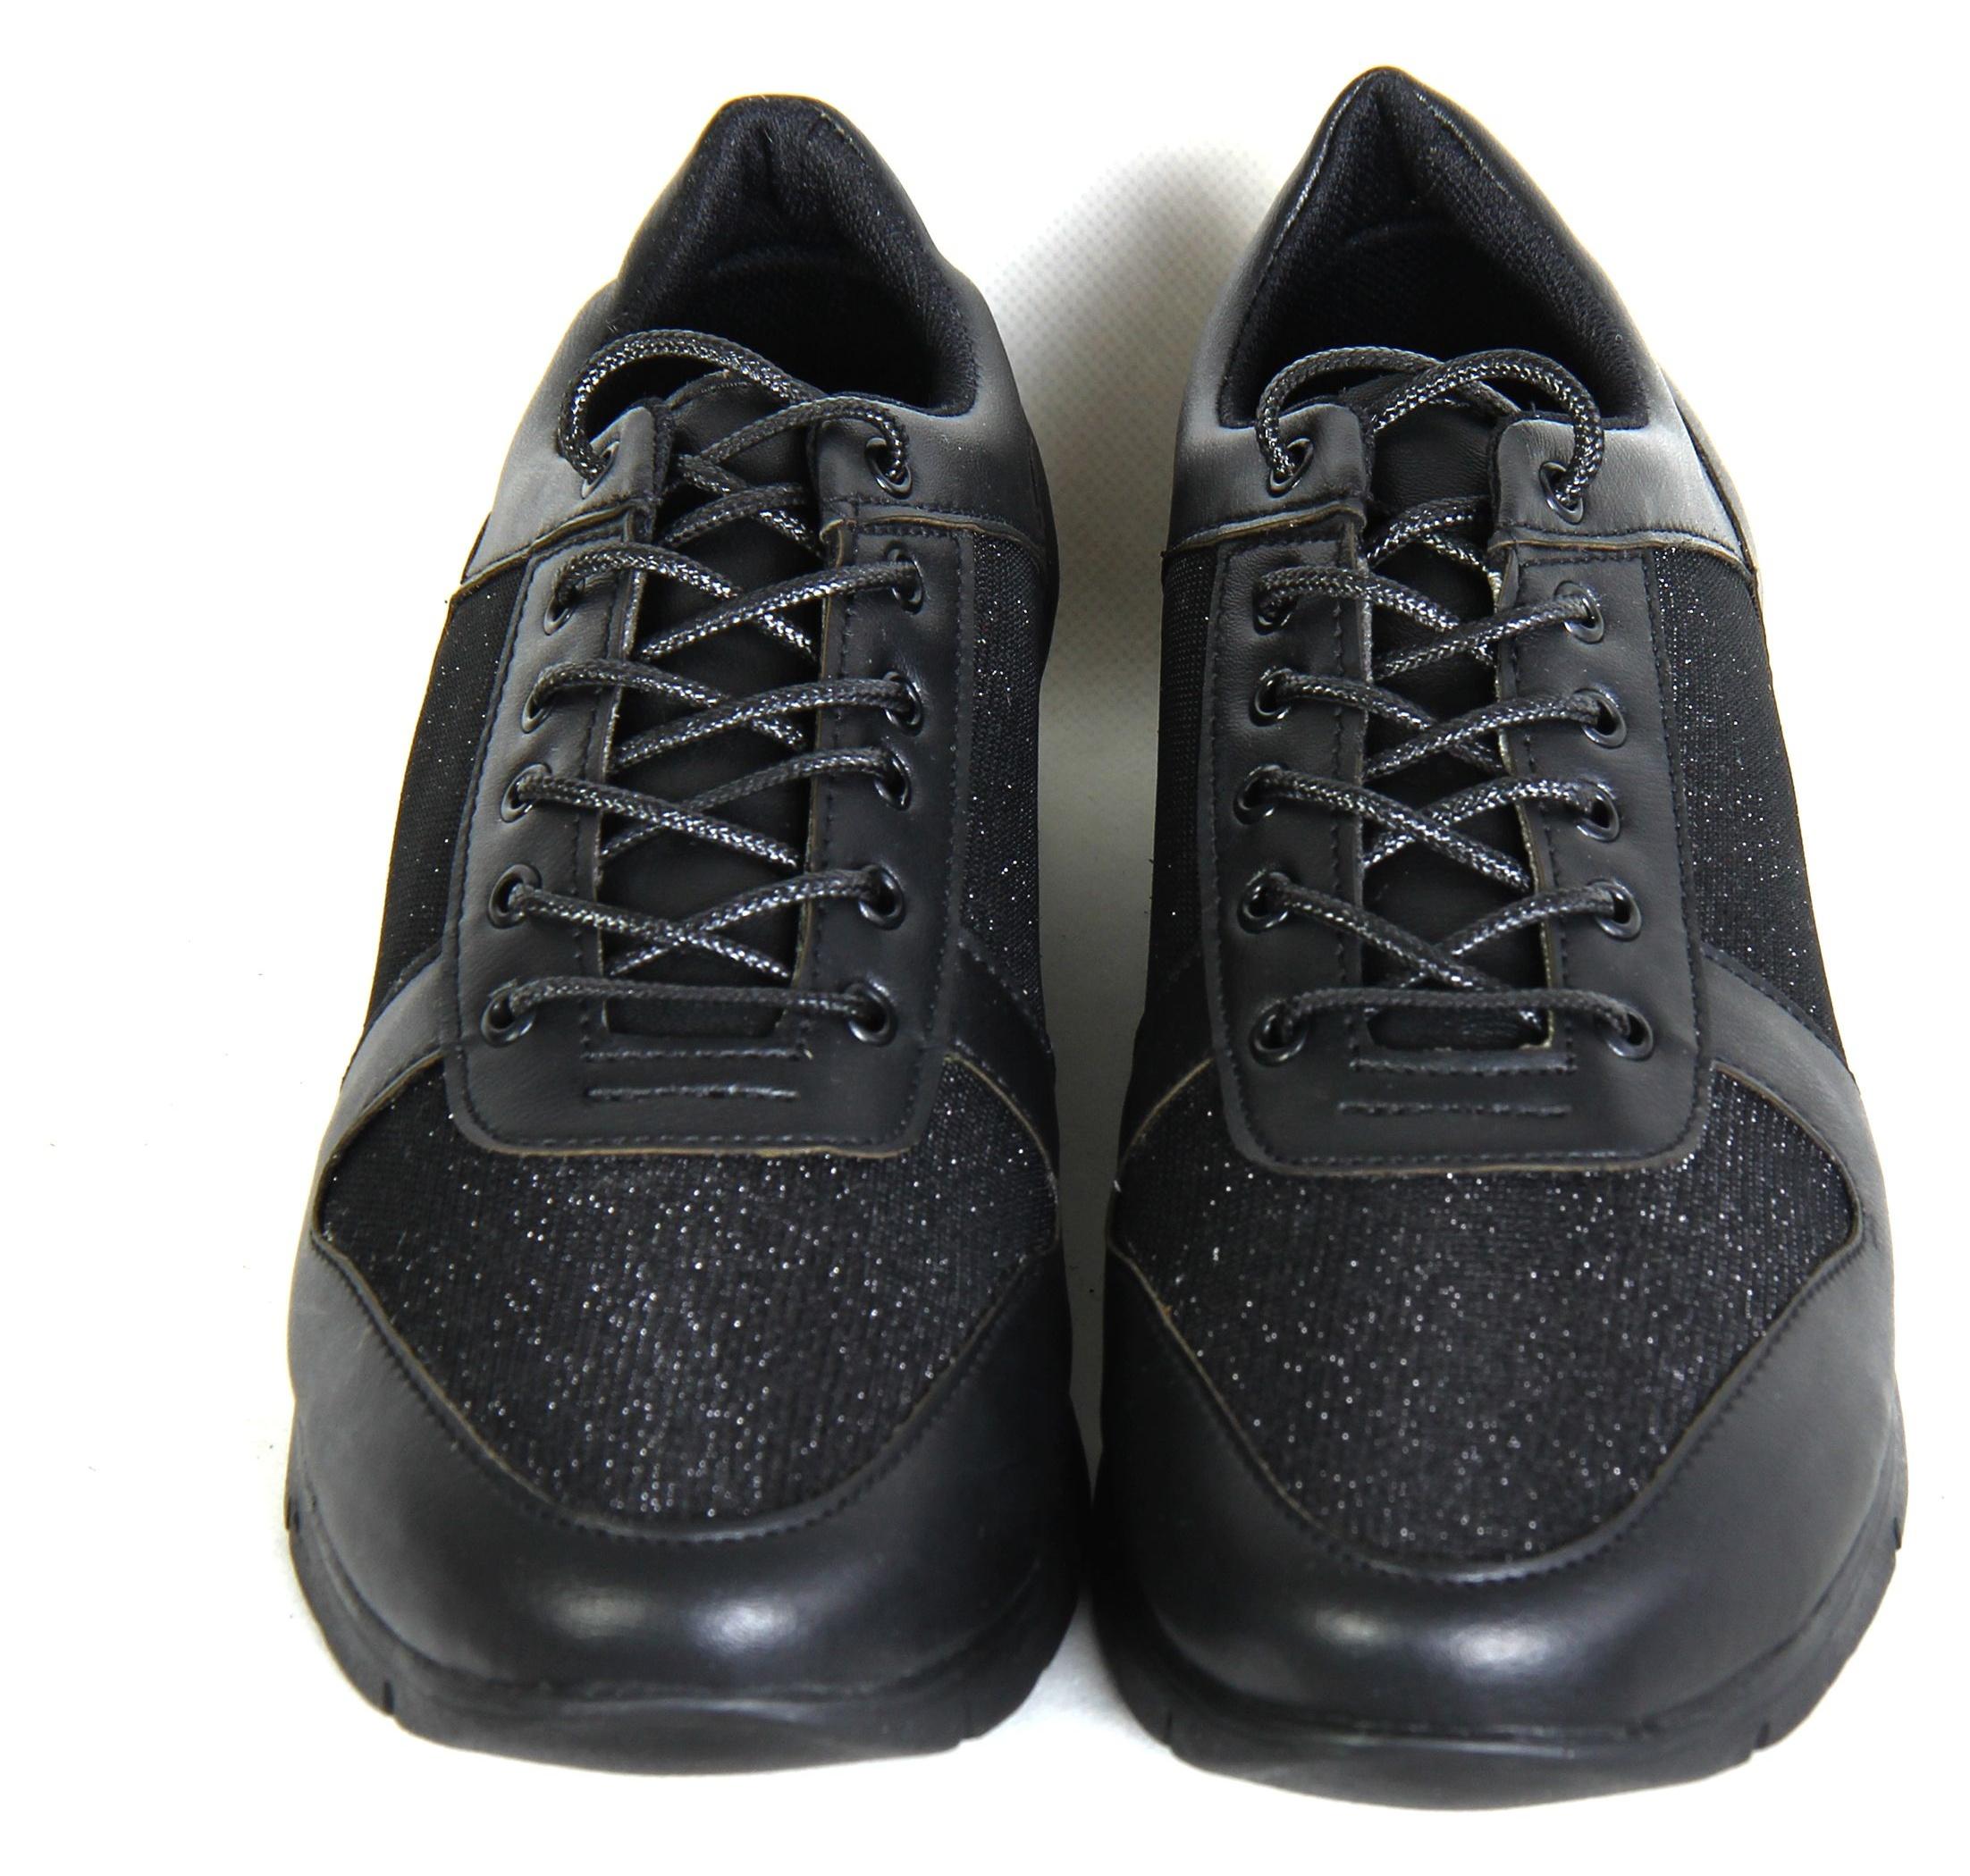 کفش روزمره زنانه کد 013 main 1 4